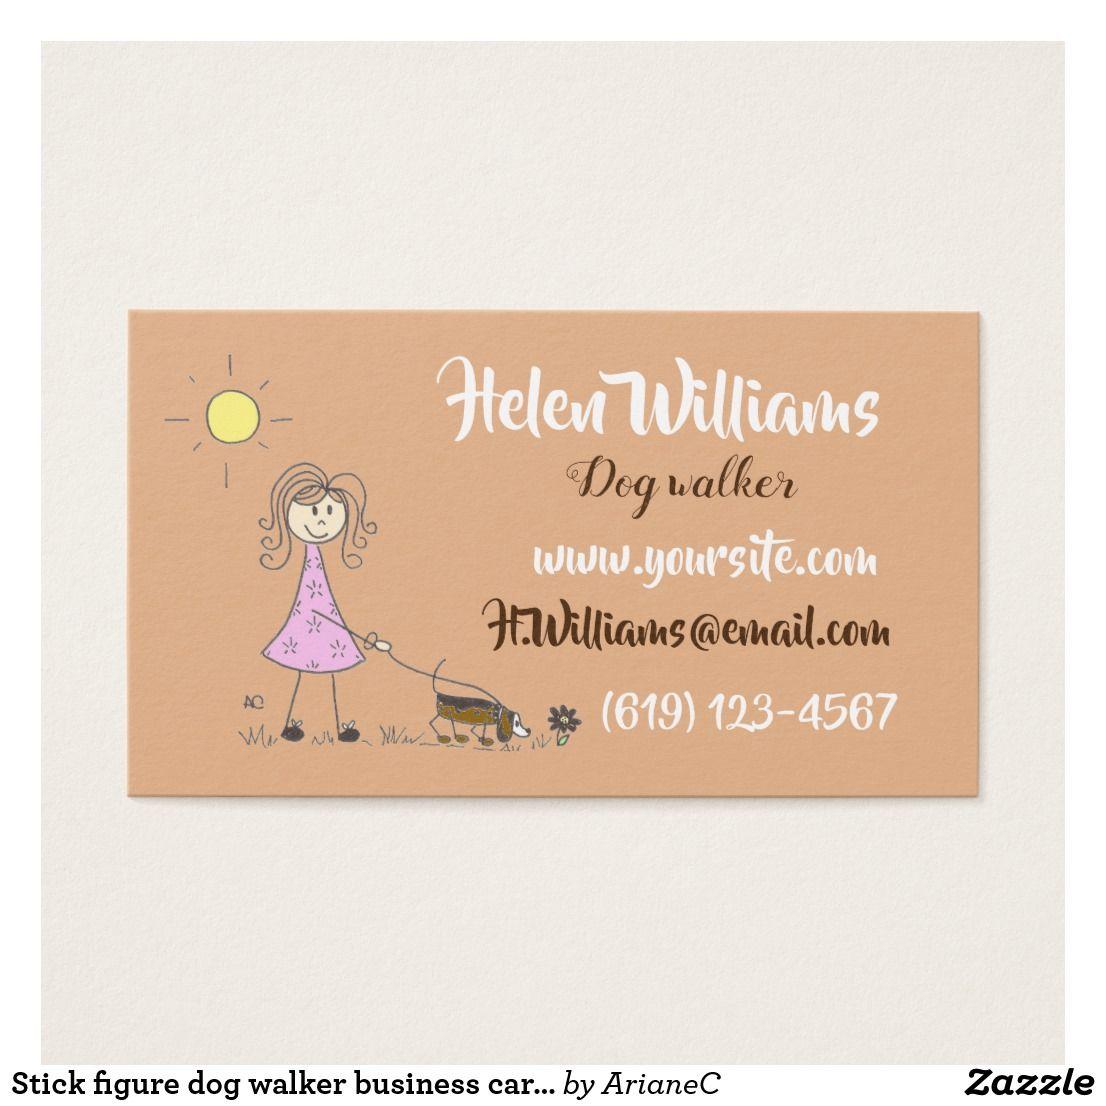 Stick figure dog walker business cards | Stick figures, Business ...